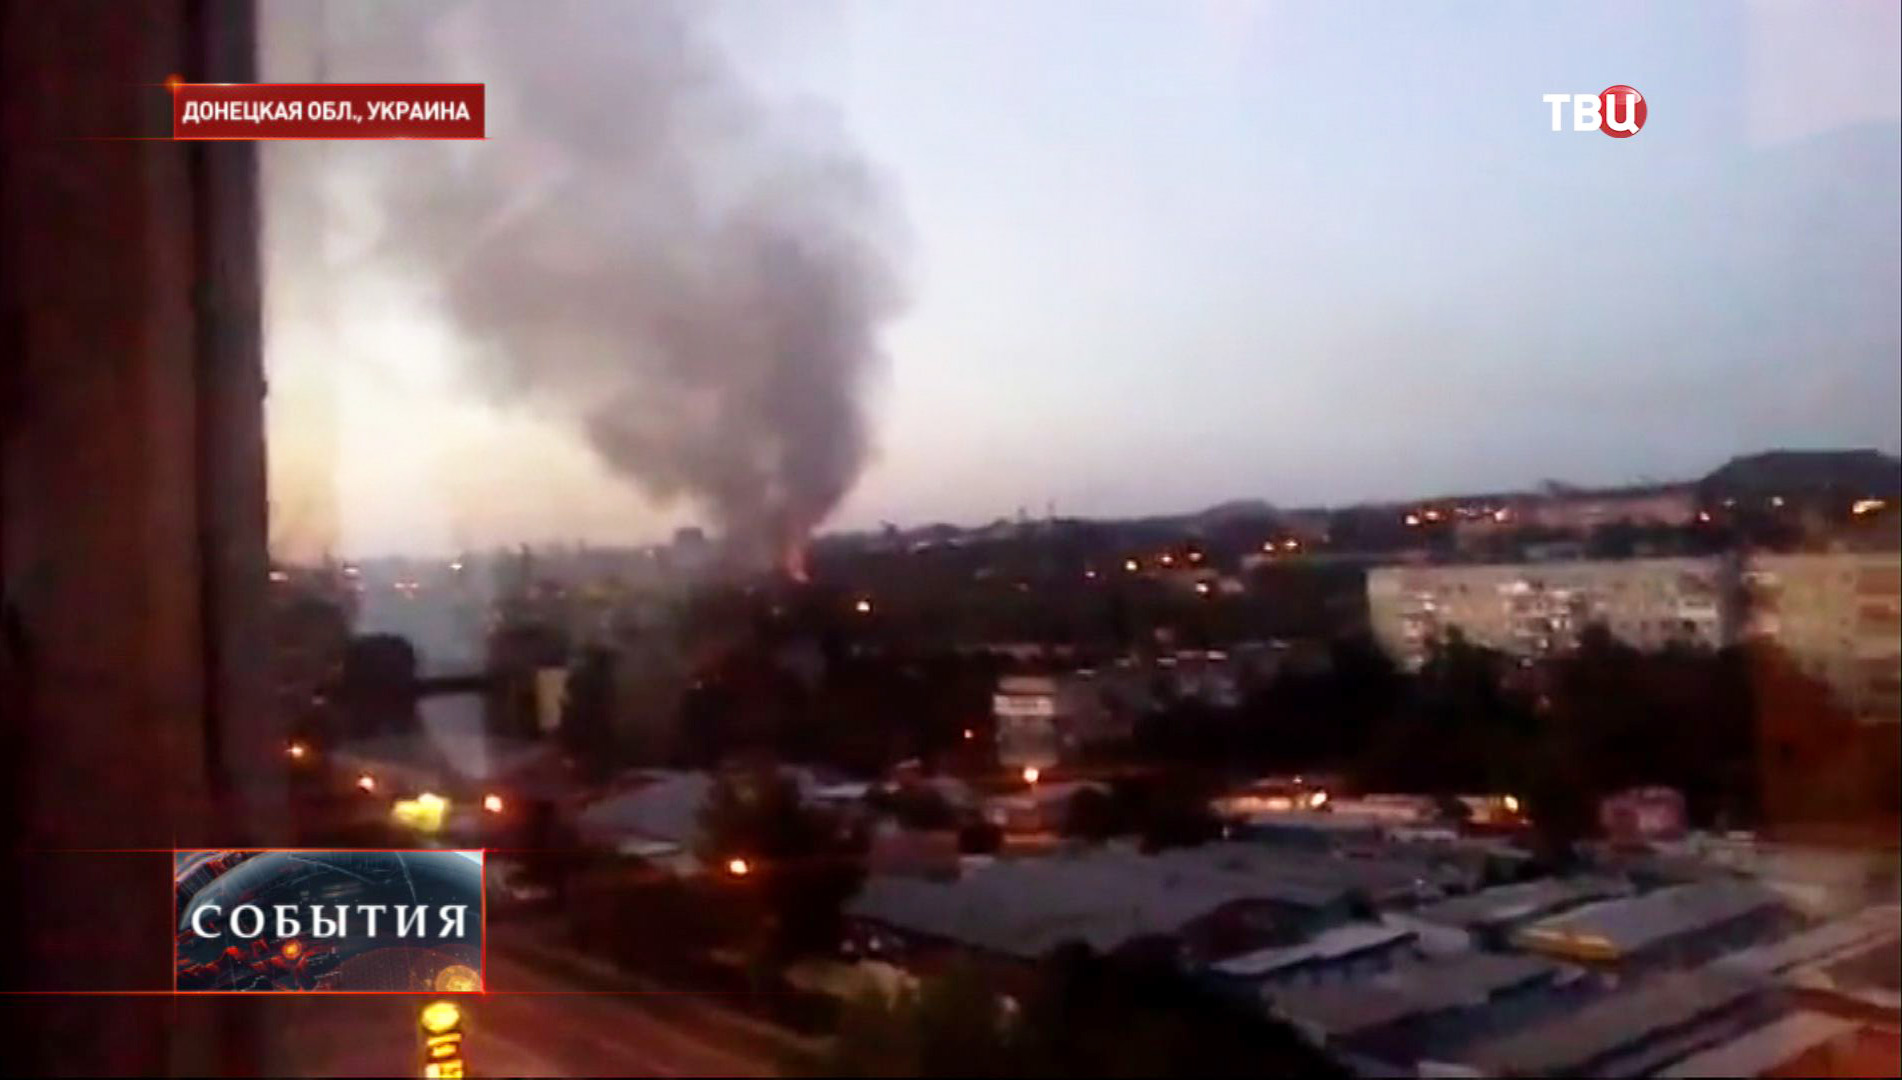 Пожар на складе с боеприпасами на территории воинской части в Донецке